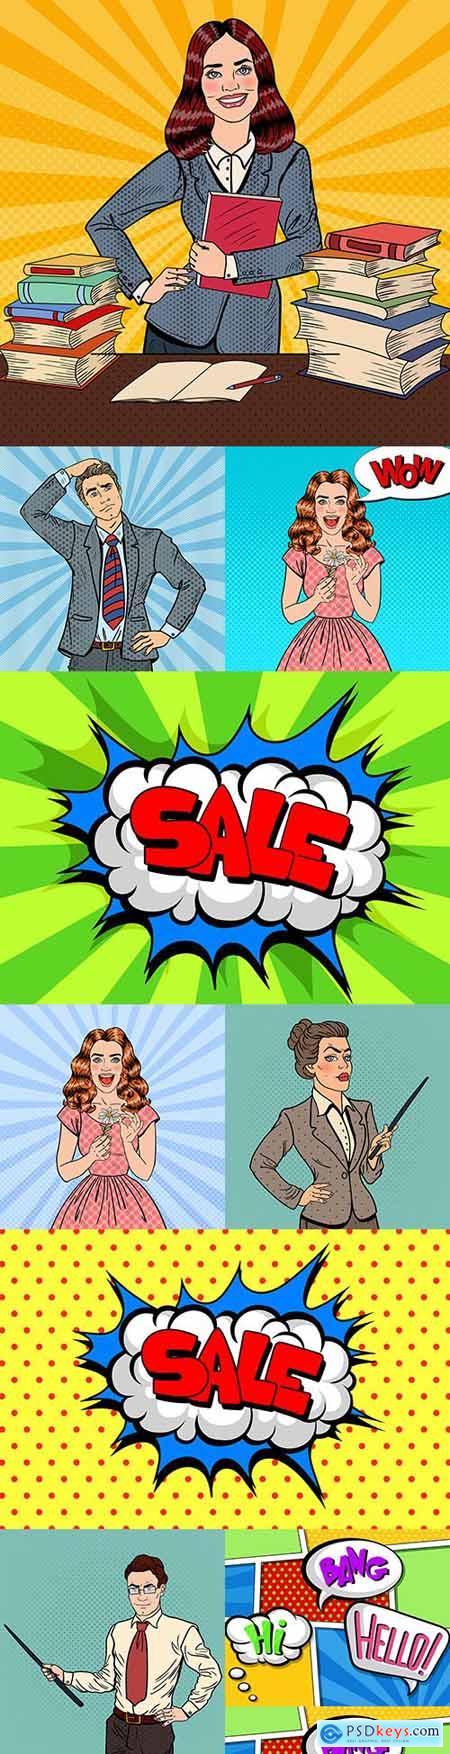 Man and woman comic speech bubble illustrations pop art 4